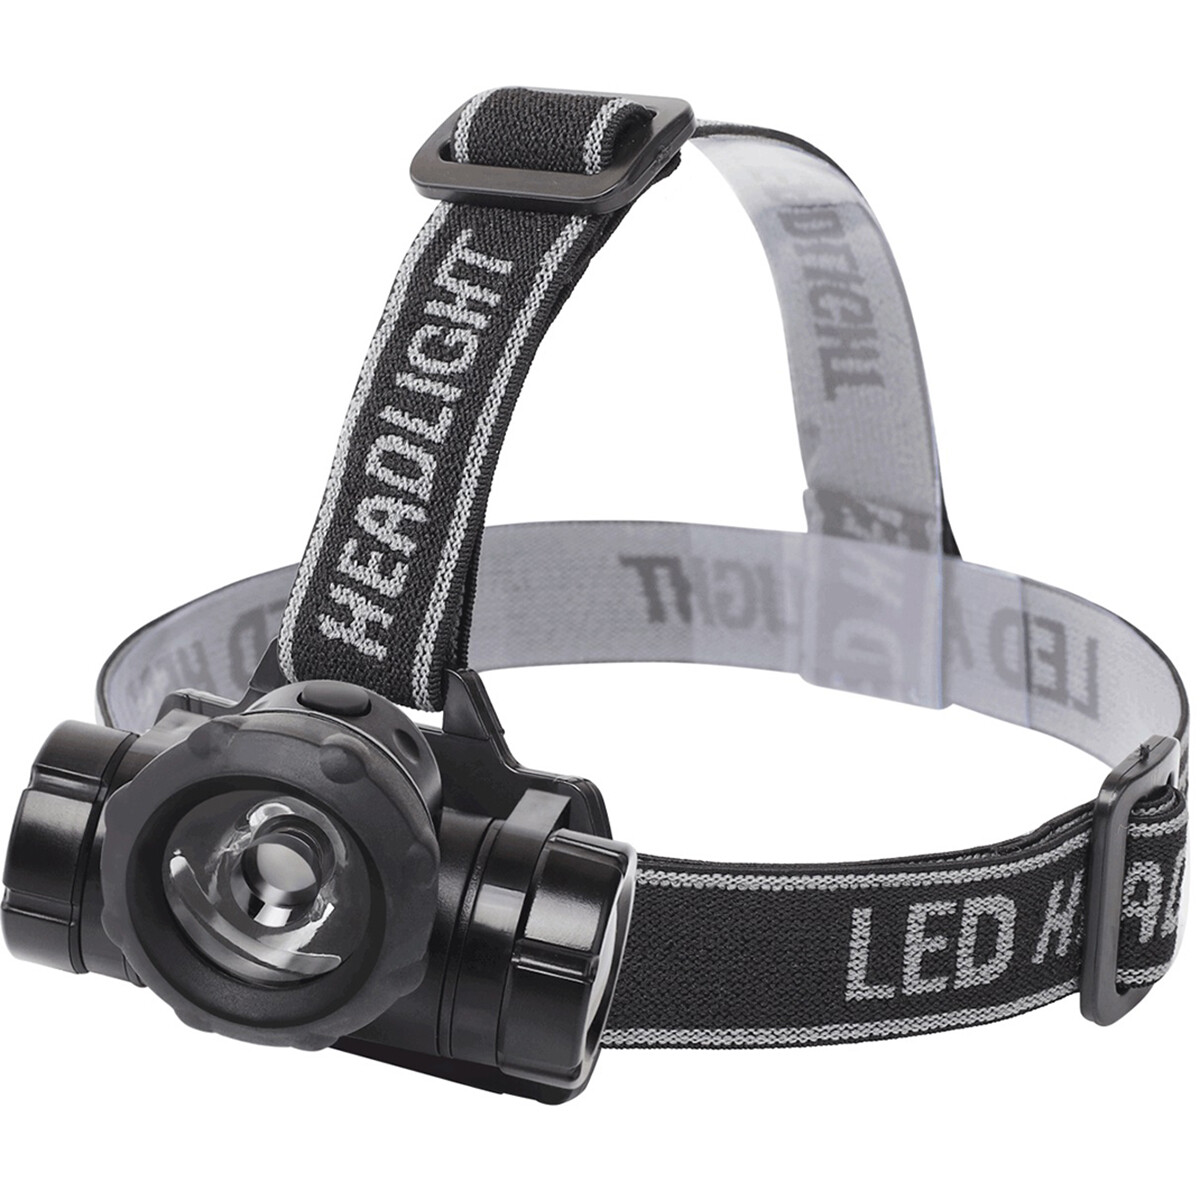 LED Hoofdlamp - Aigi Buvin - Waterdicht - 50 Meter - Kantelbaar - 1 LED - 1.8W - Zwart | Vervangt 10